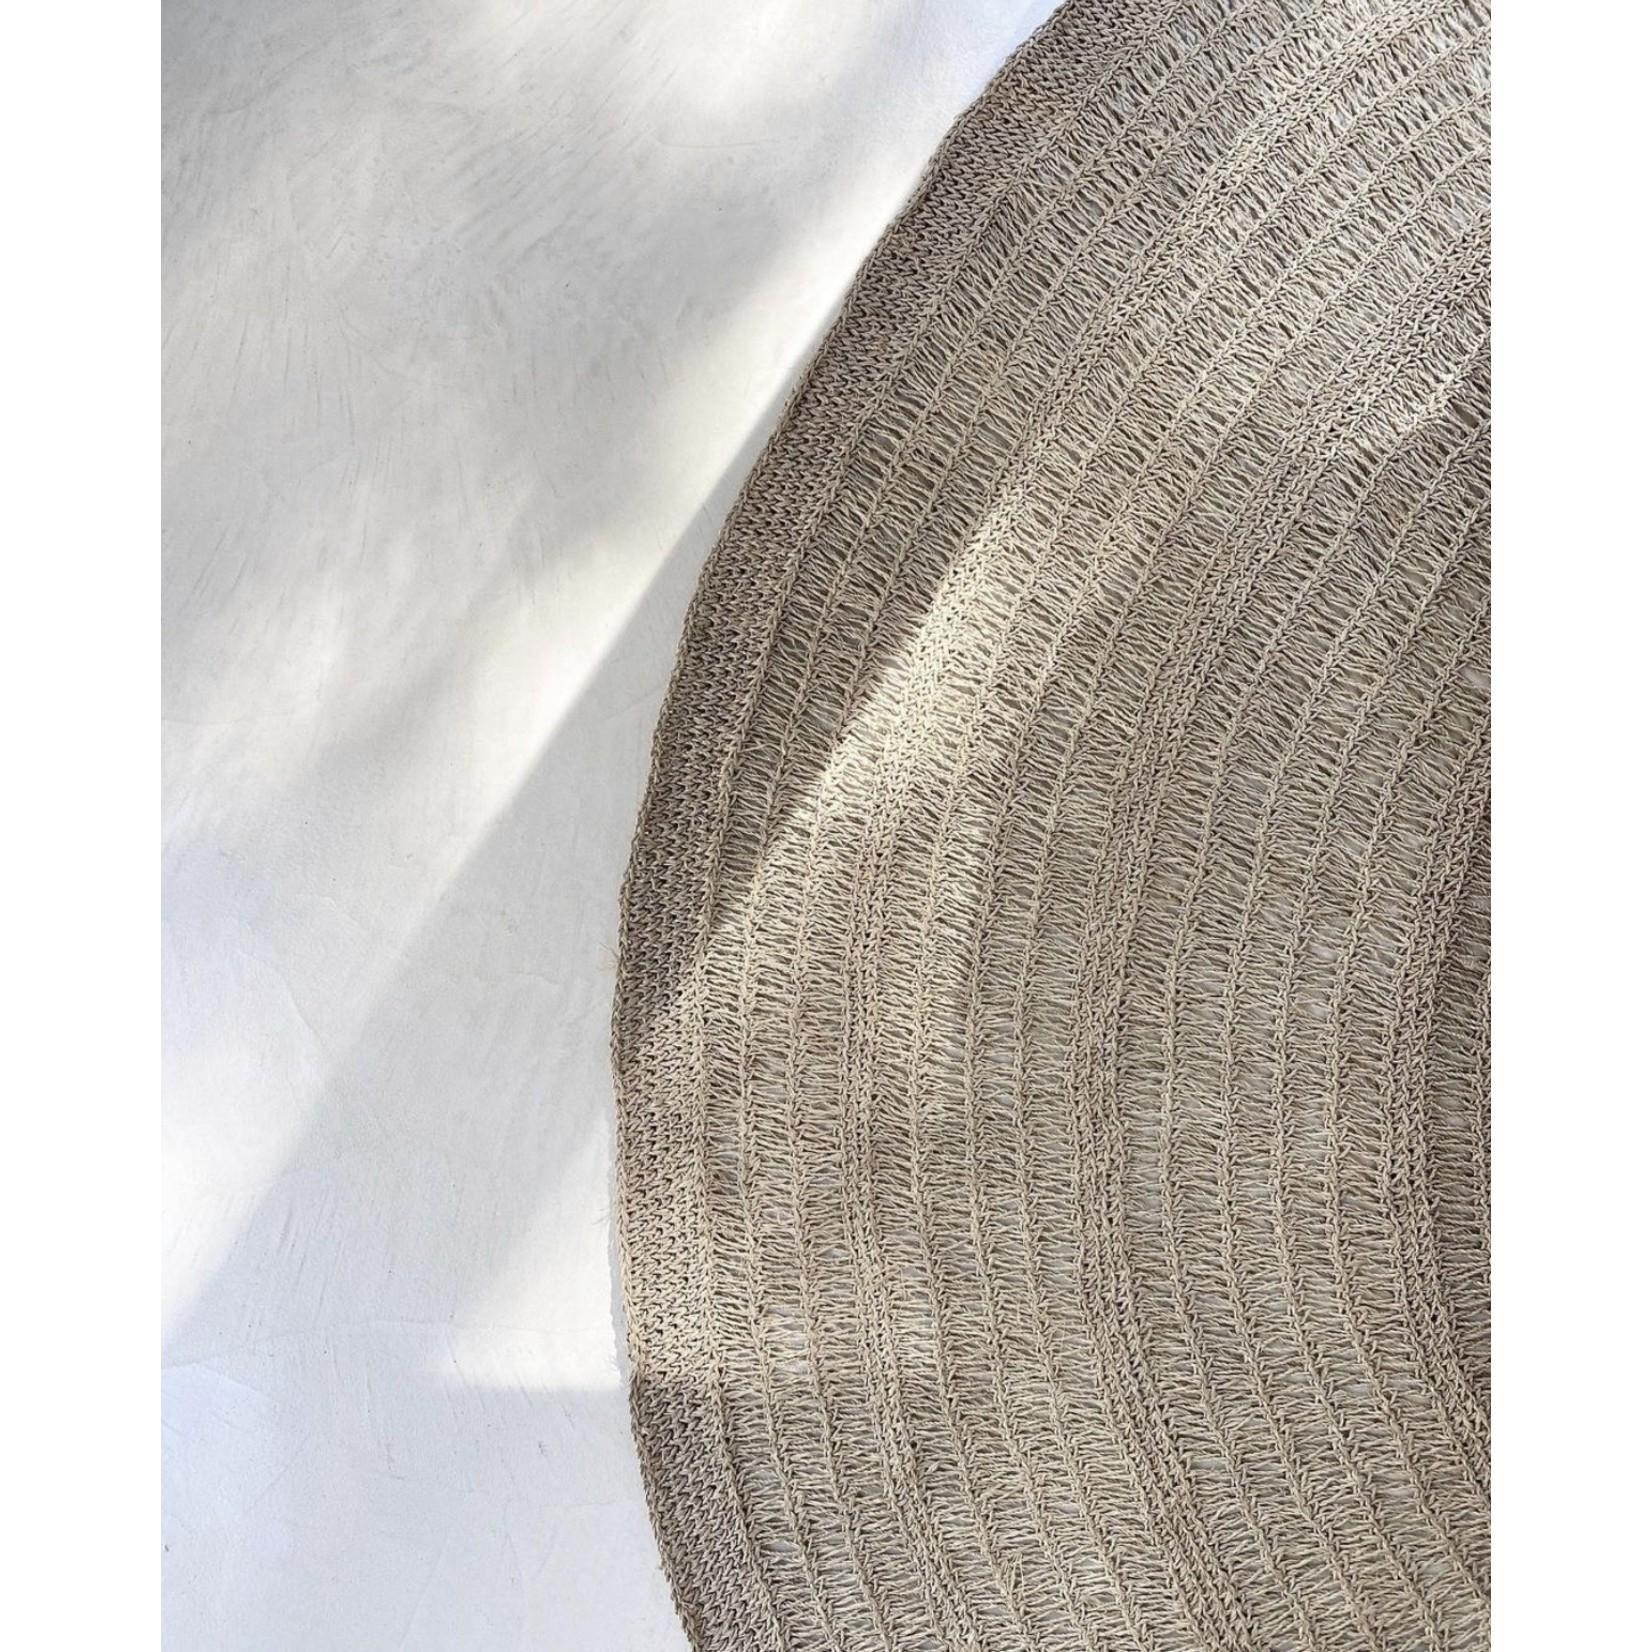 Bazar Bizar De Seagrass Tapijt - Naturel - 150cm